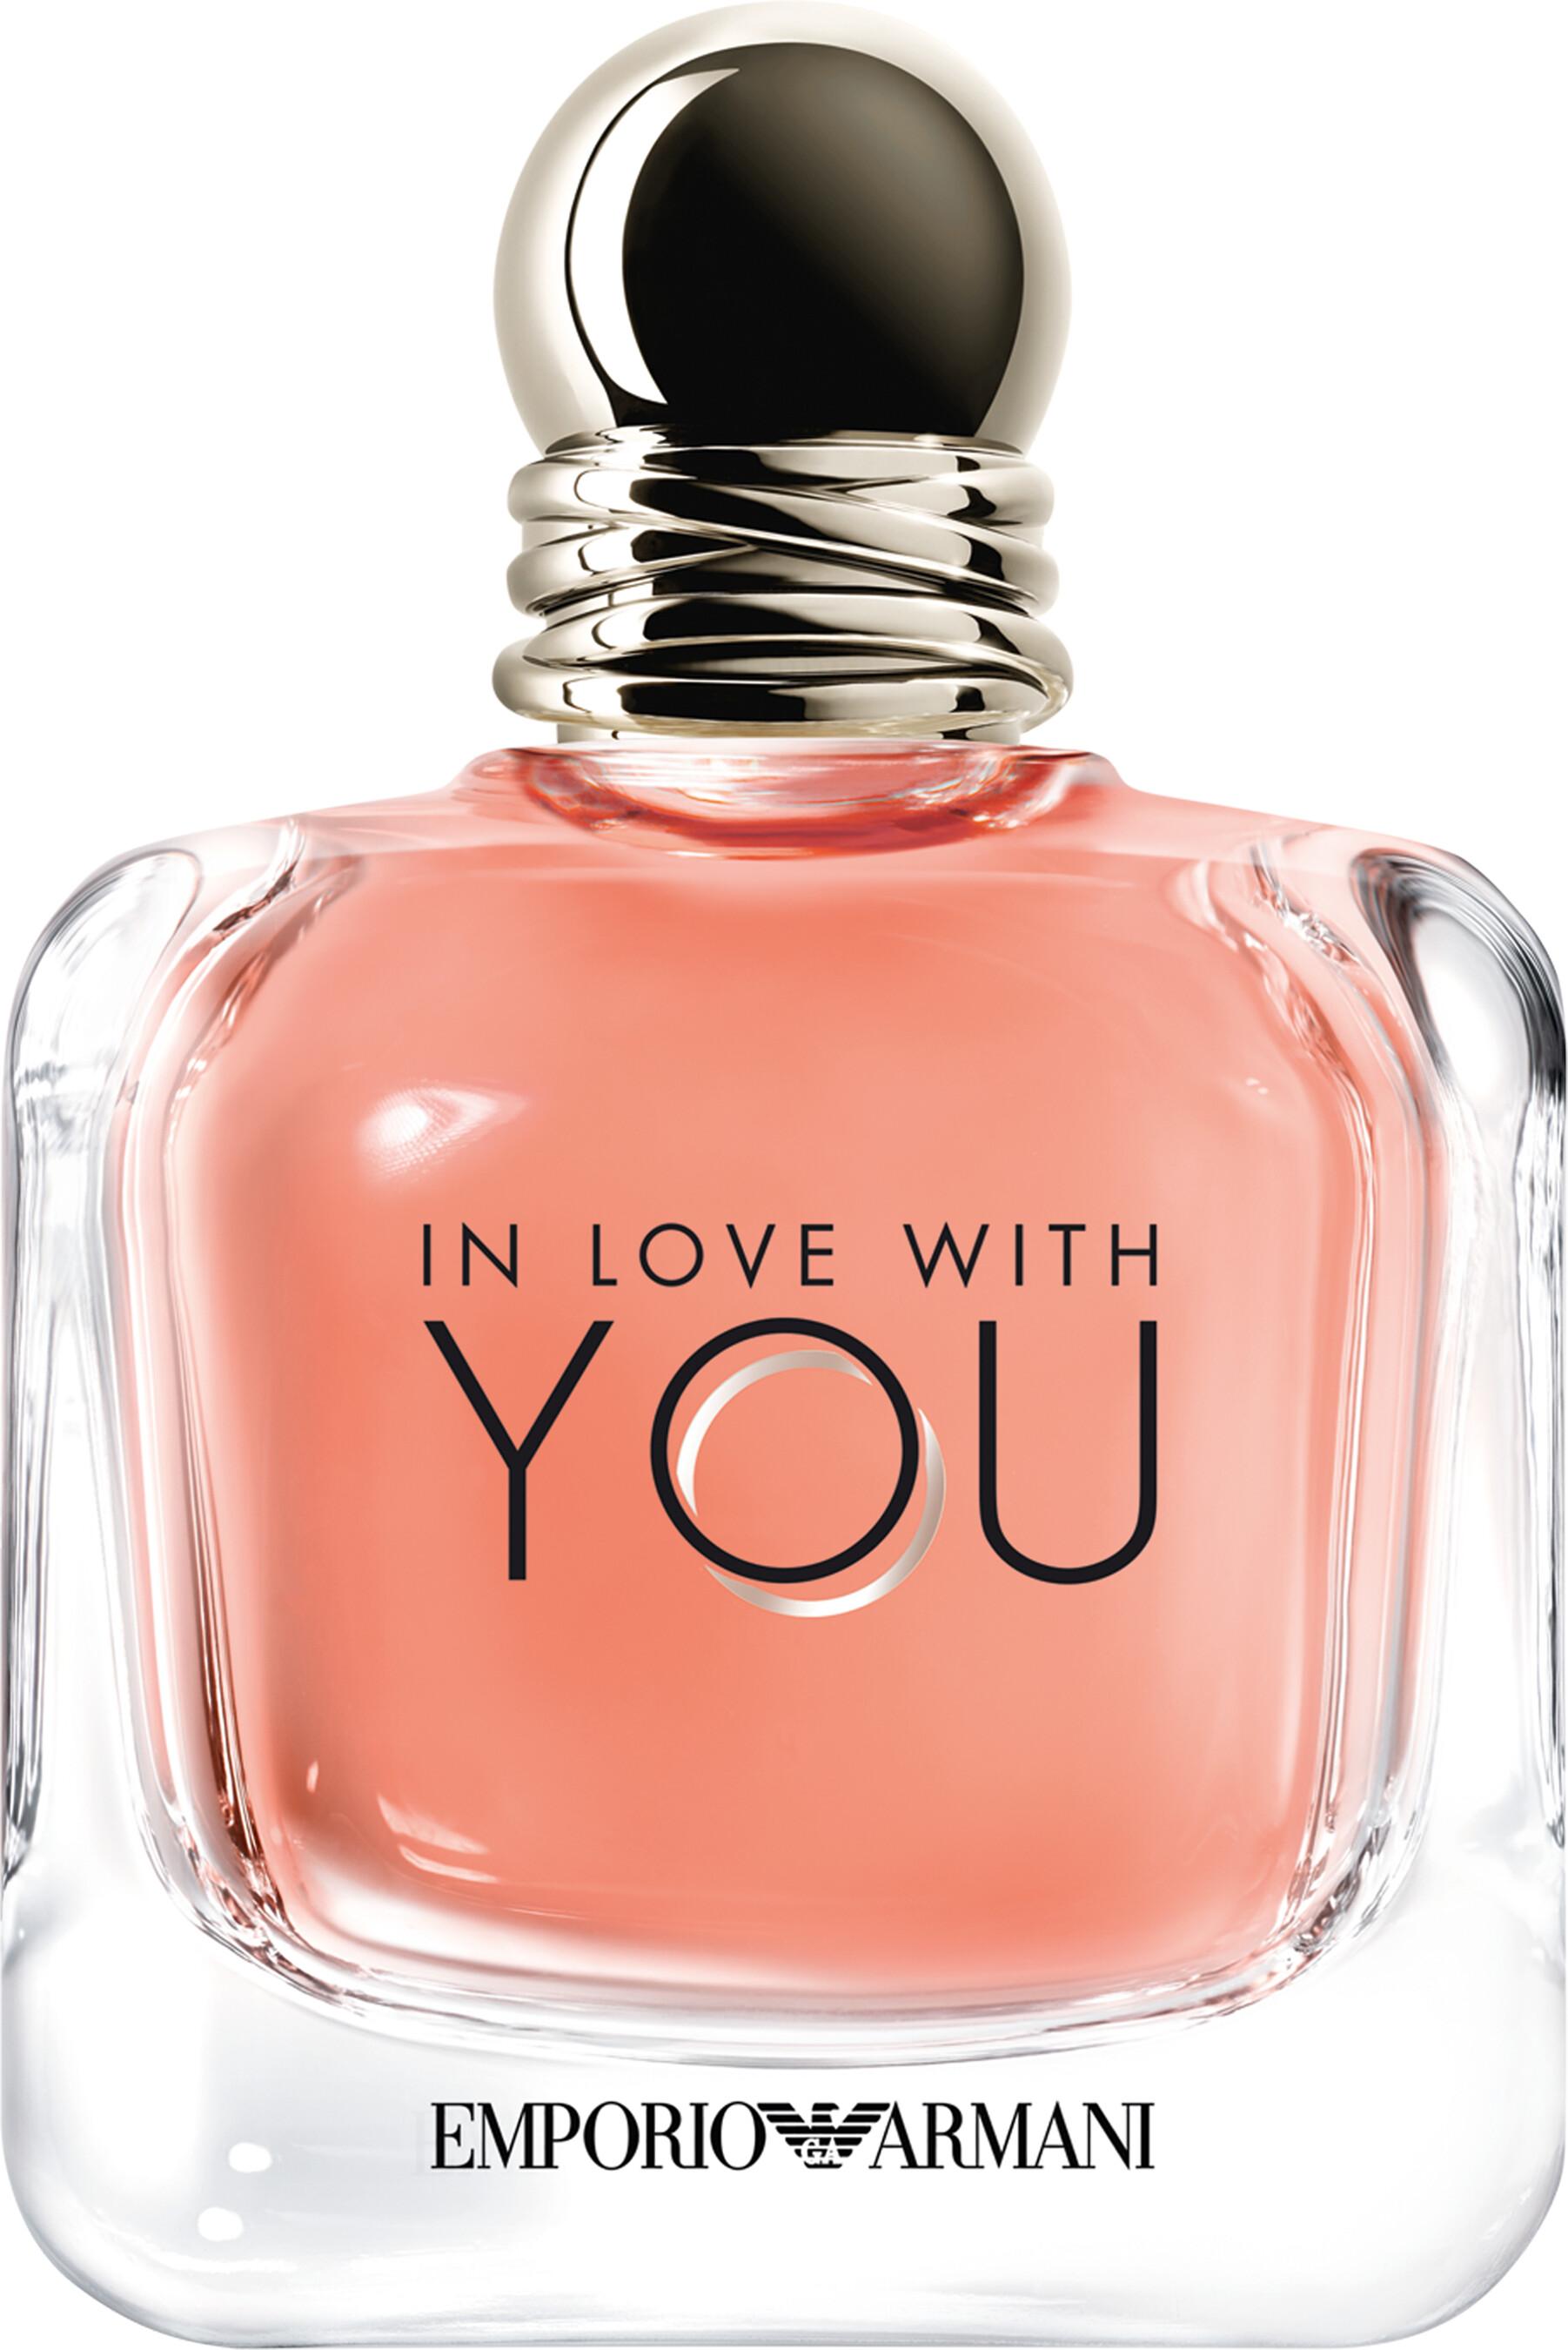 aef9f2dd485 ... Giorgio Armani Emporio Armani In Love With You Eau de Parfum Spray 100ml